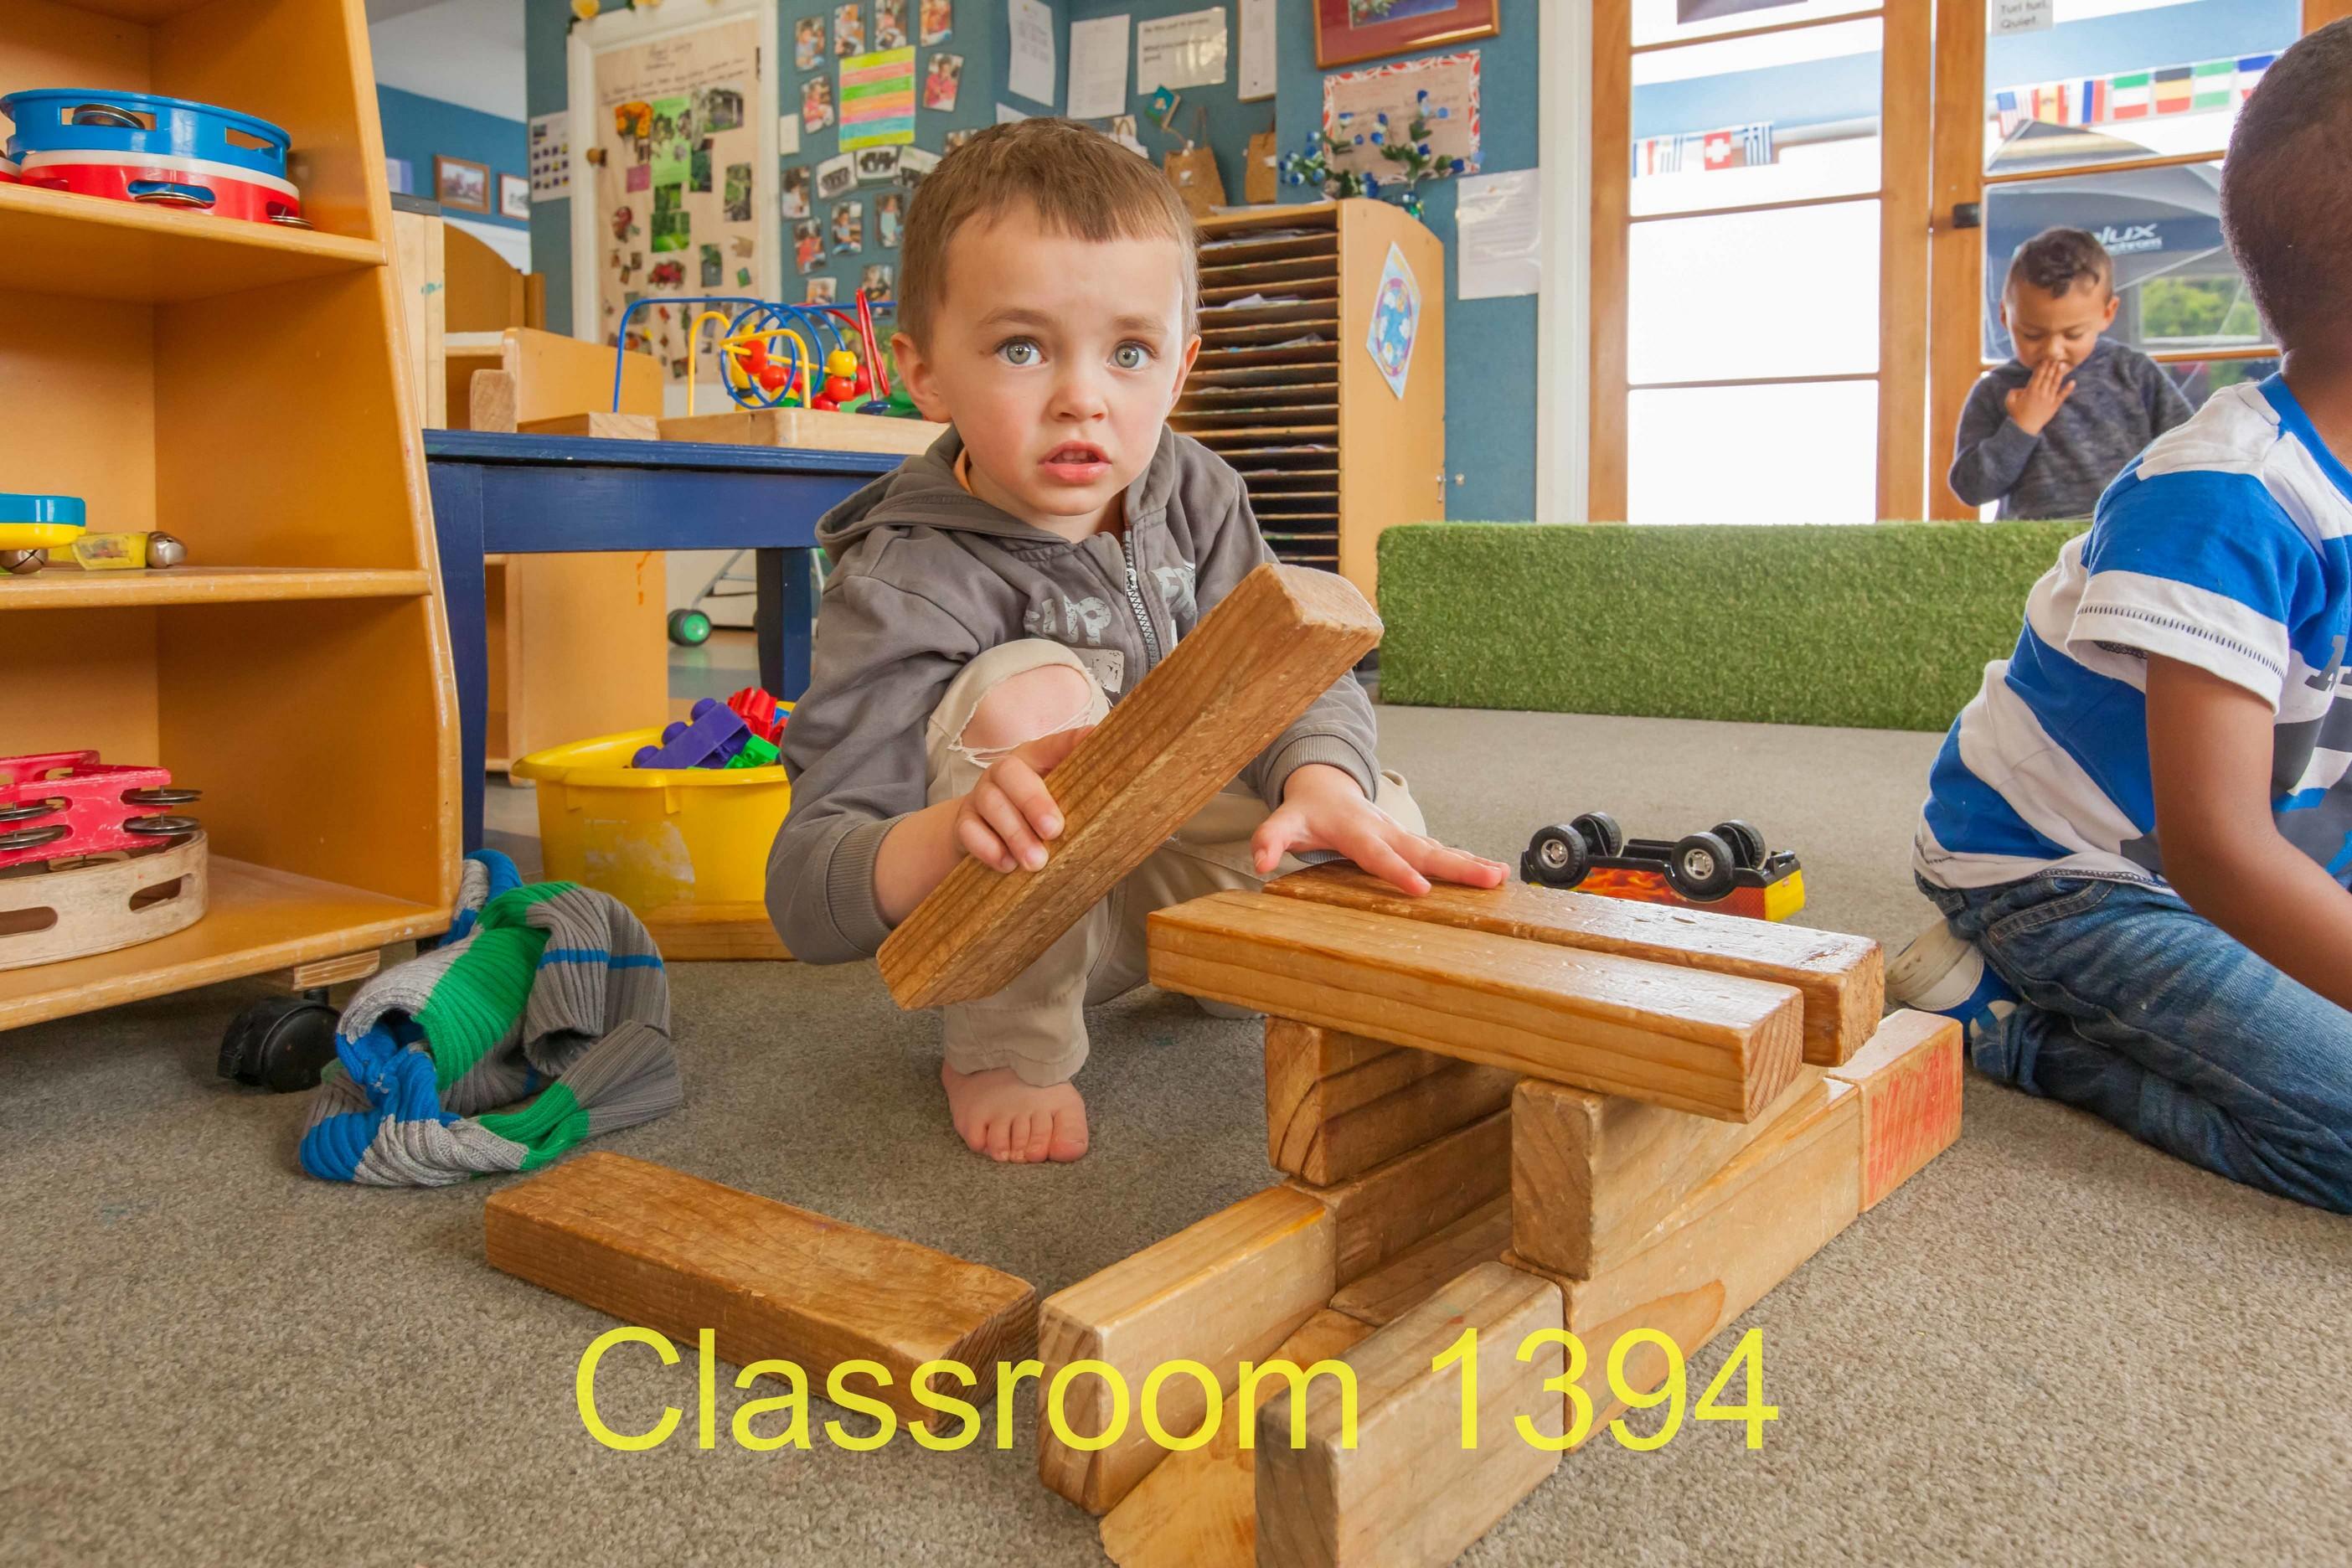 Classroom 1394